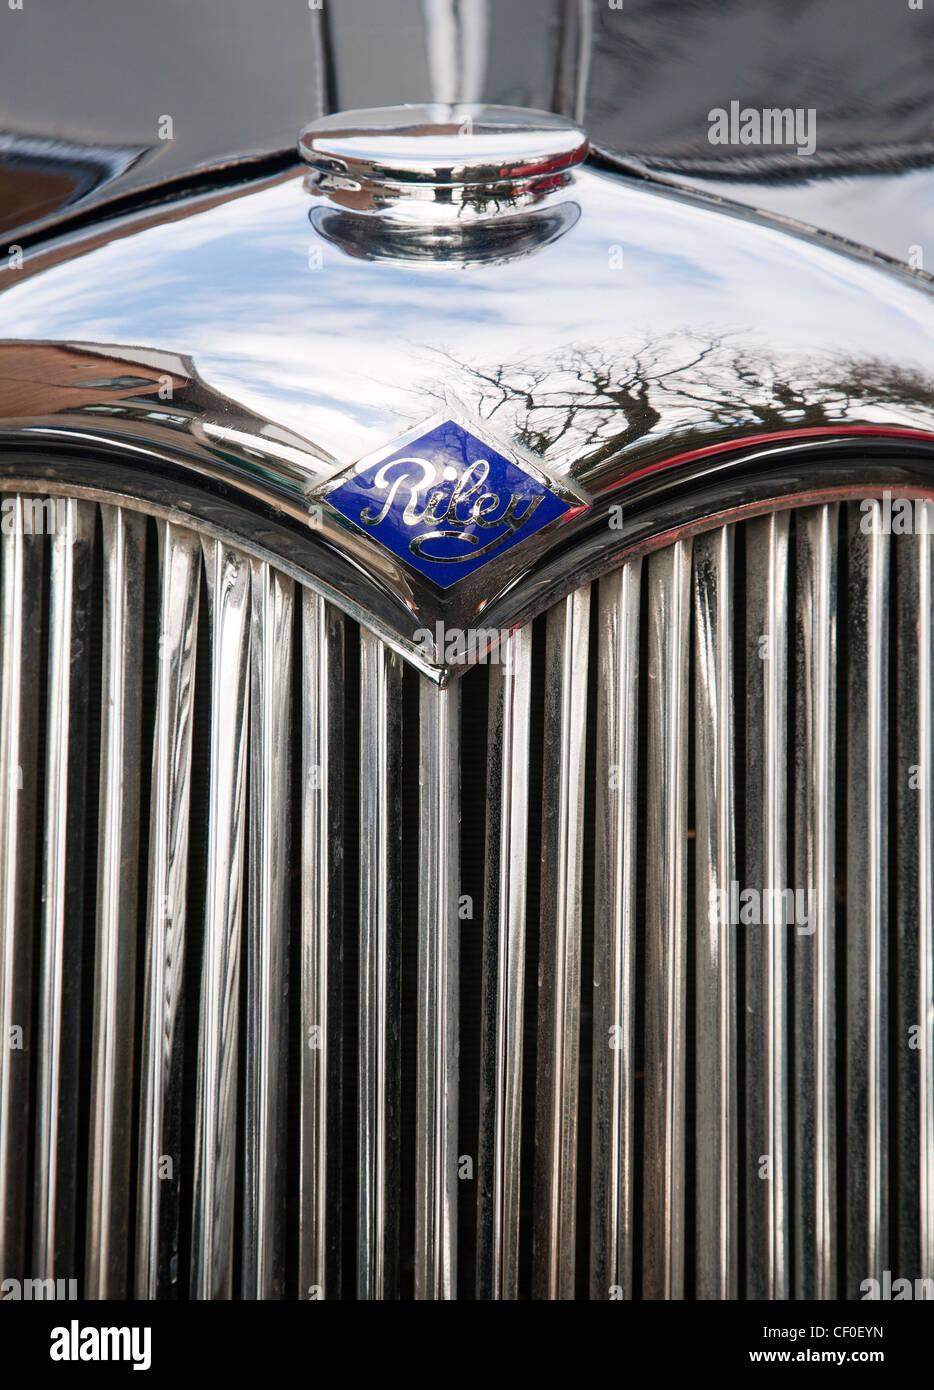 Design of a car radiator - 1950s Vintage Riley Car Radiator Grill Stock Image